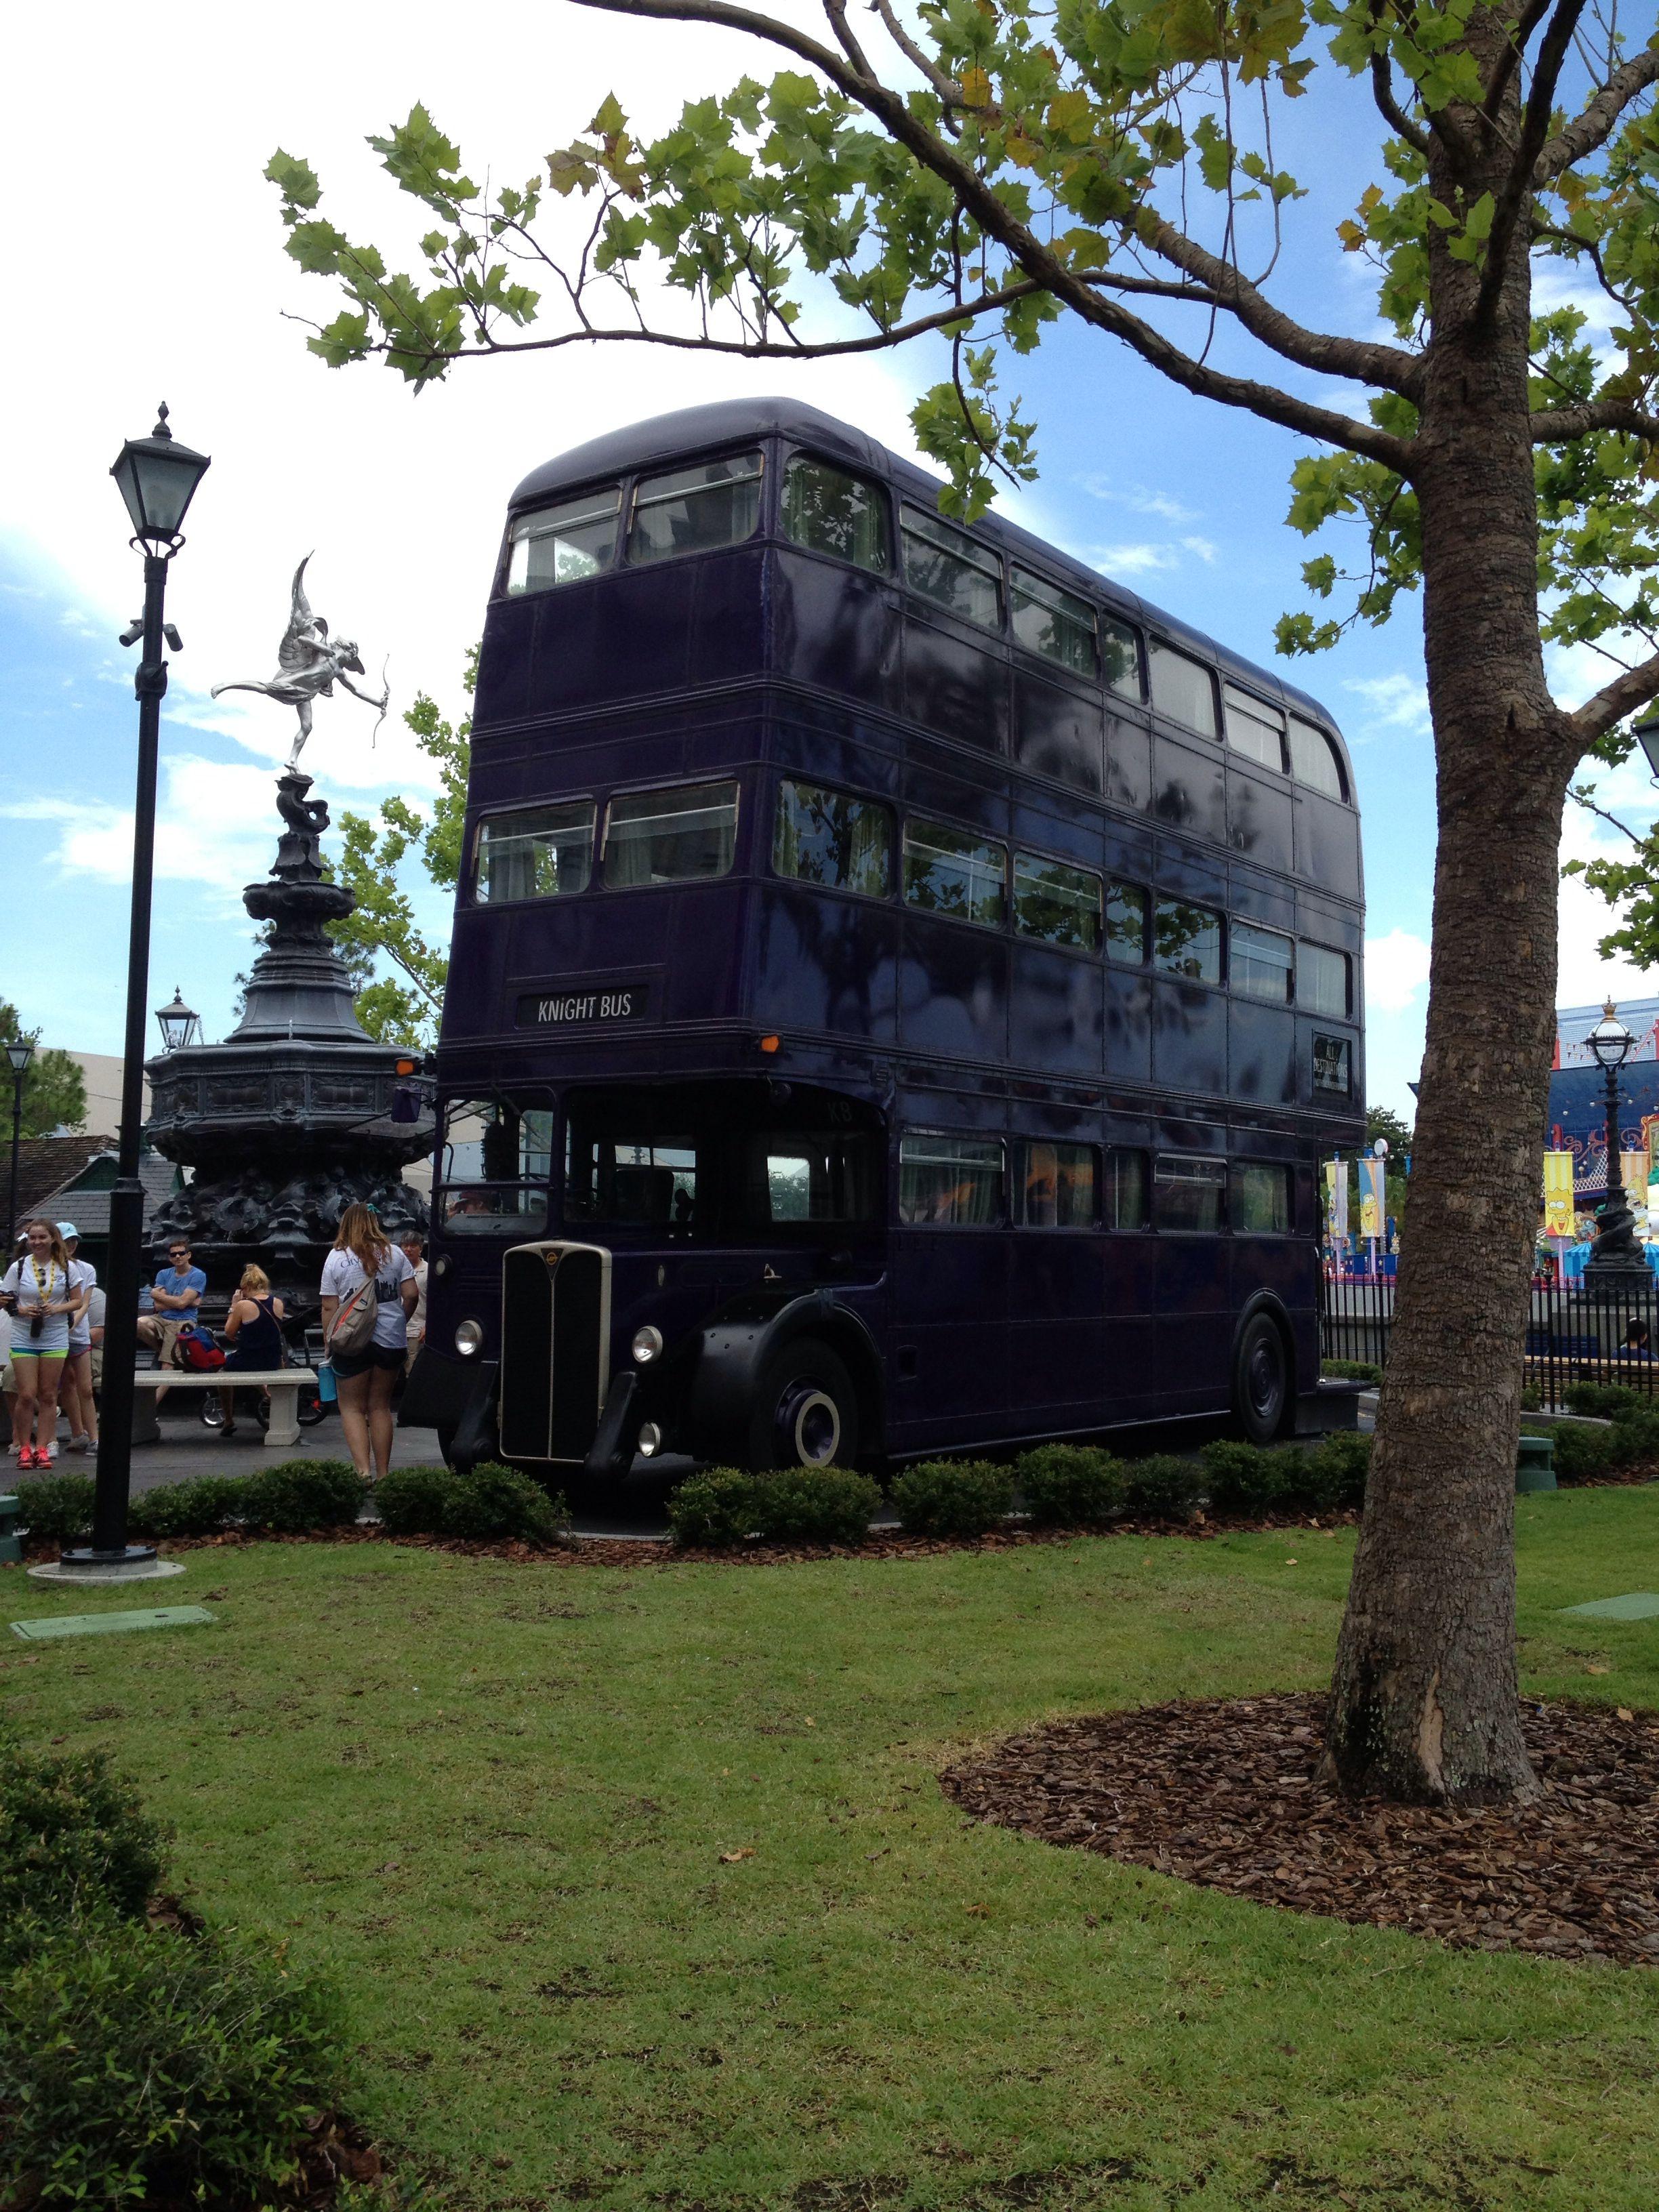 Universal Studios ~ Island of Adventure! Knight bus